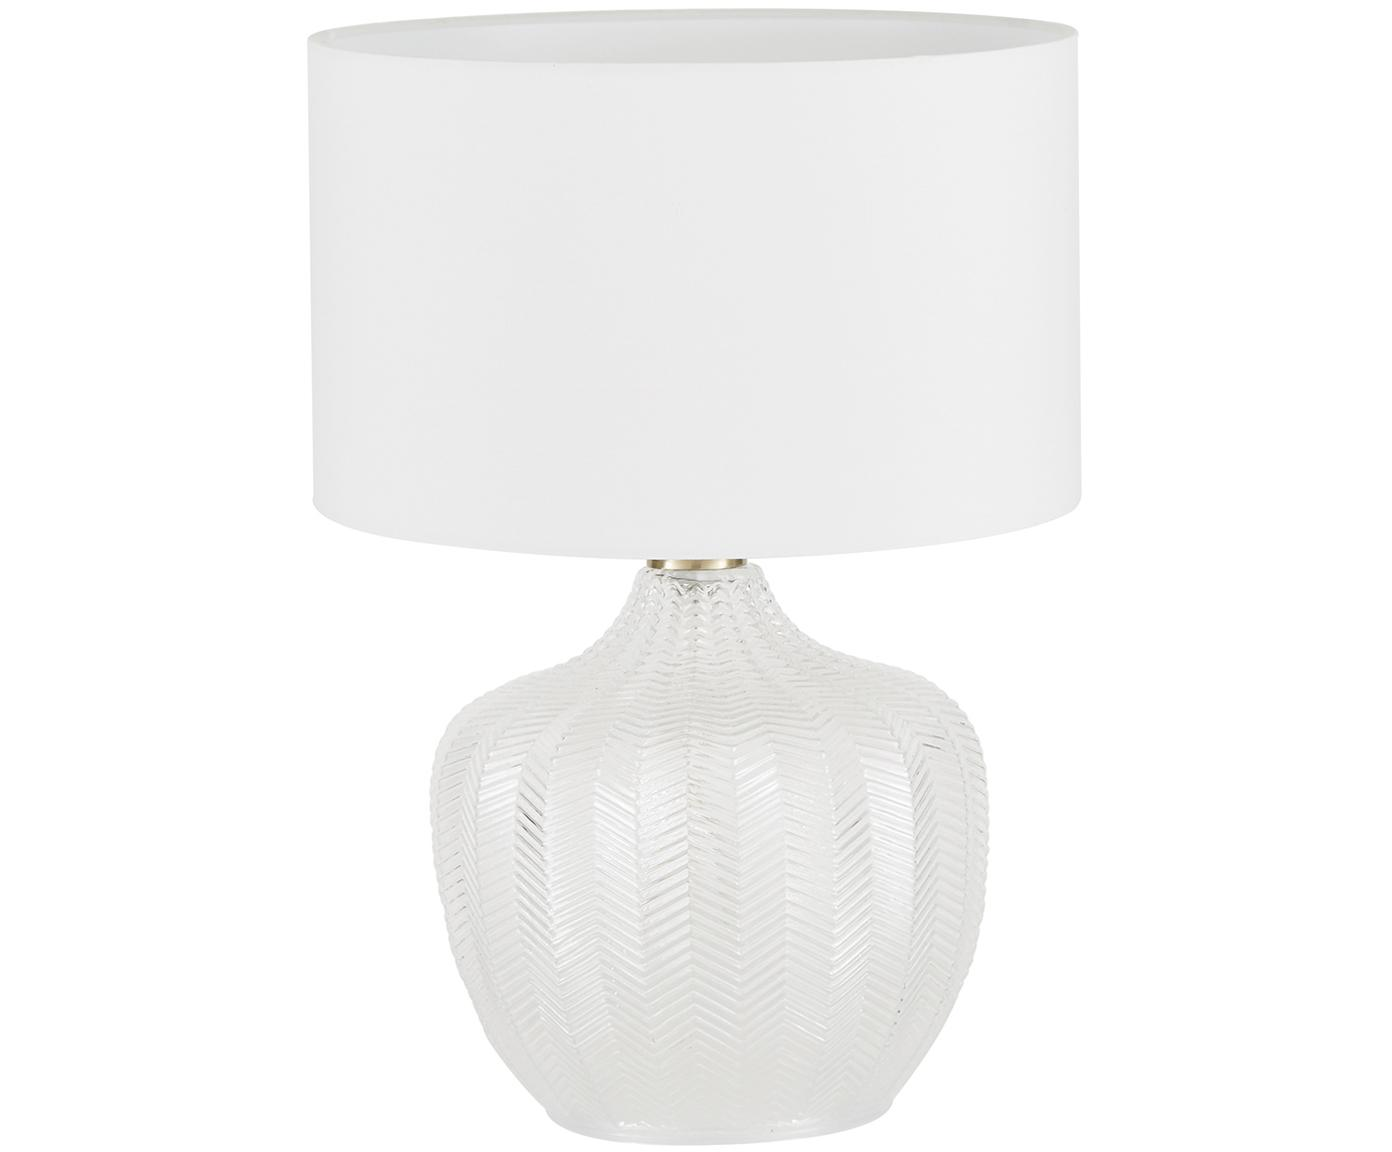 Tafellamp Sue, Lampenkap: textiel, Lampvoet: glas, vermessingd metaal, Lampenkap: wit lampvoet: transparant, geborsteld messing, Ø 33 x H 47 cm